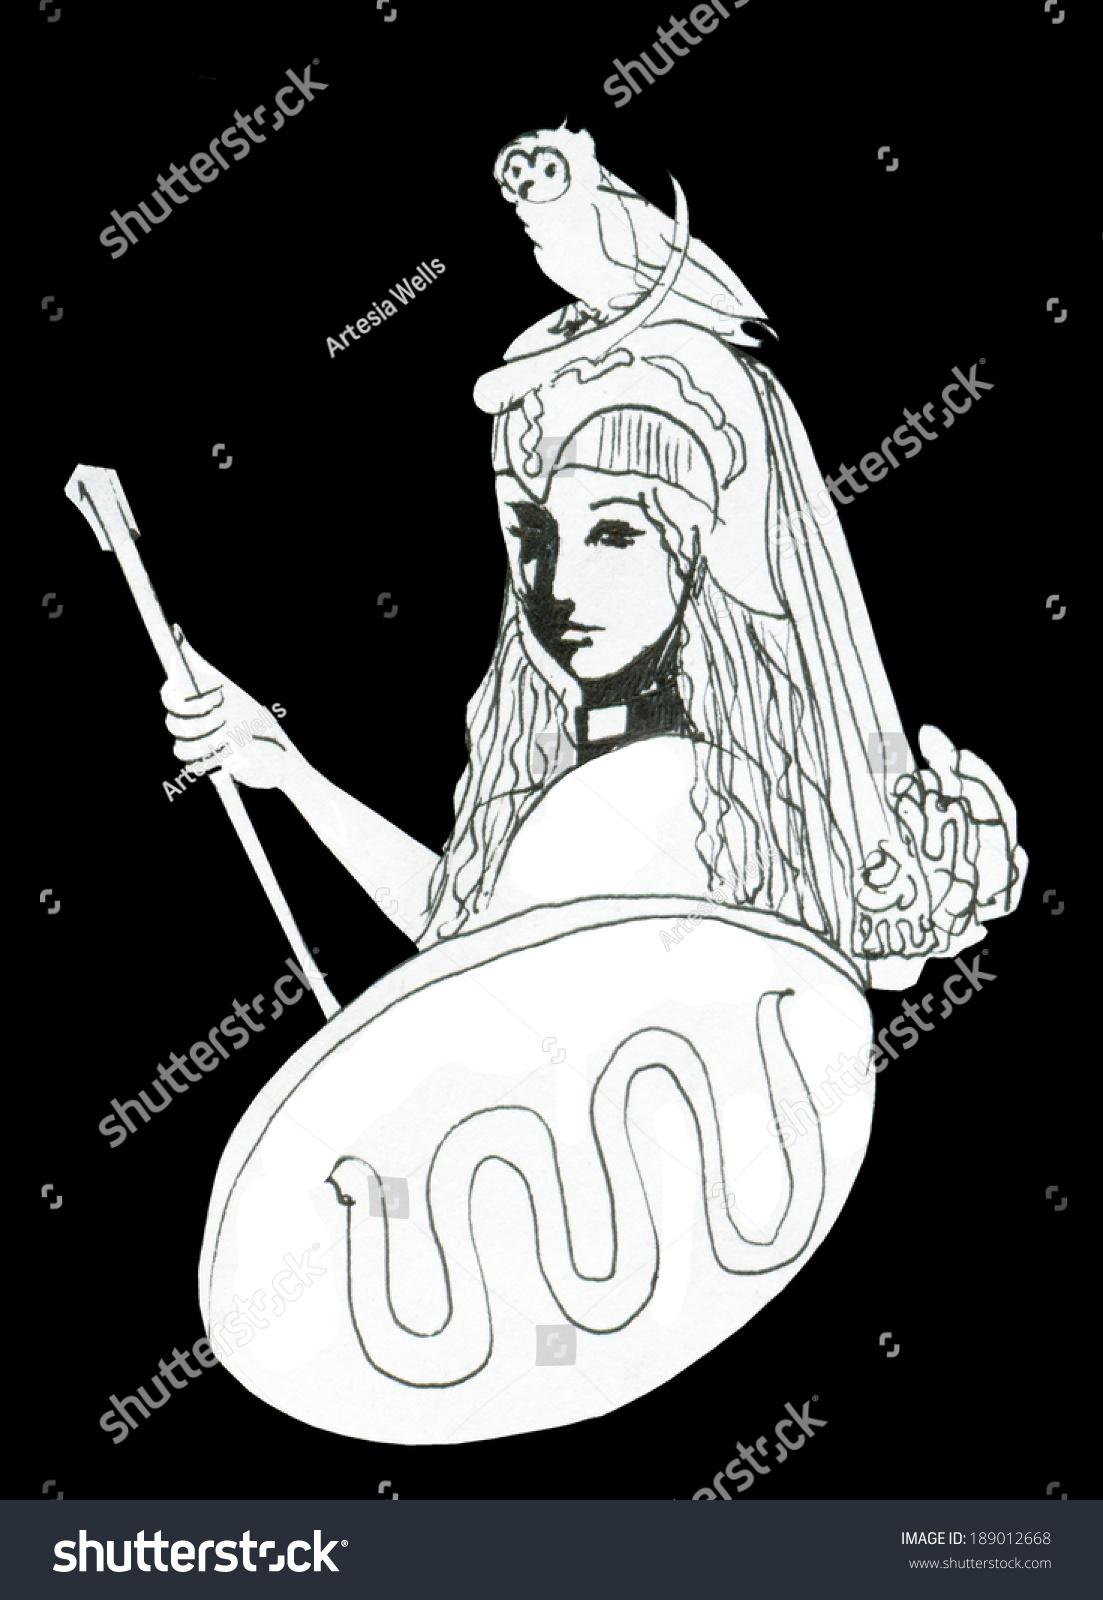 Pallas athena goddess symbol wisdom intellect stock illustration pallas athena goddess symbol of wisdom intellect creativity and strength for example biocorpaavc Images